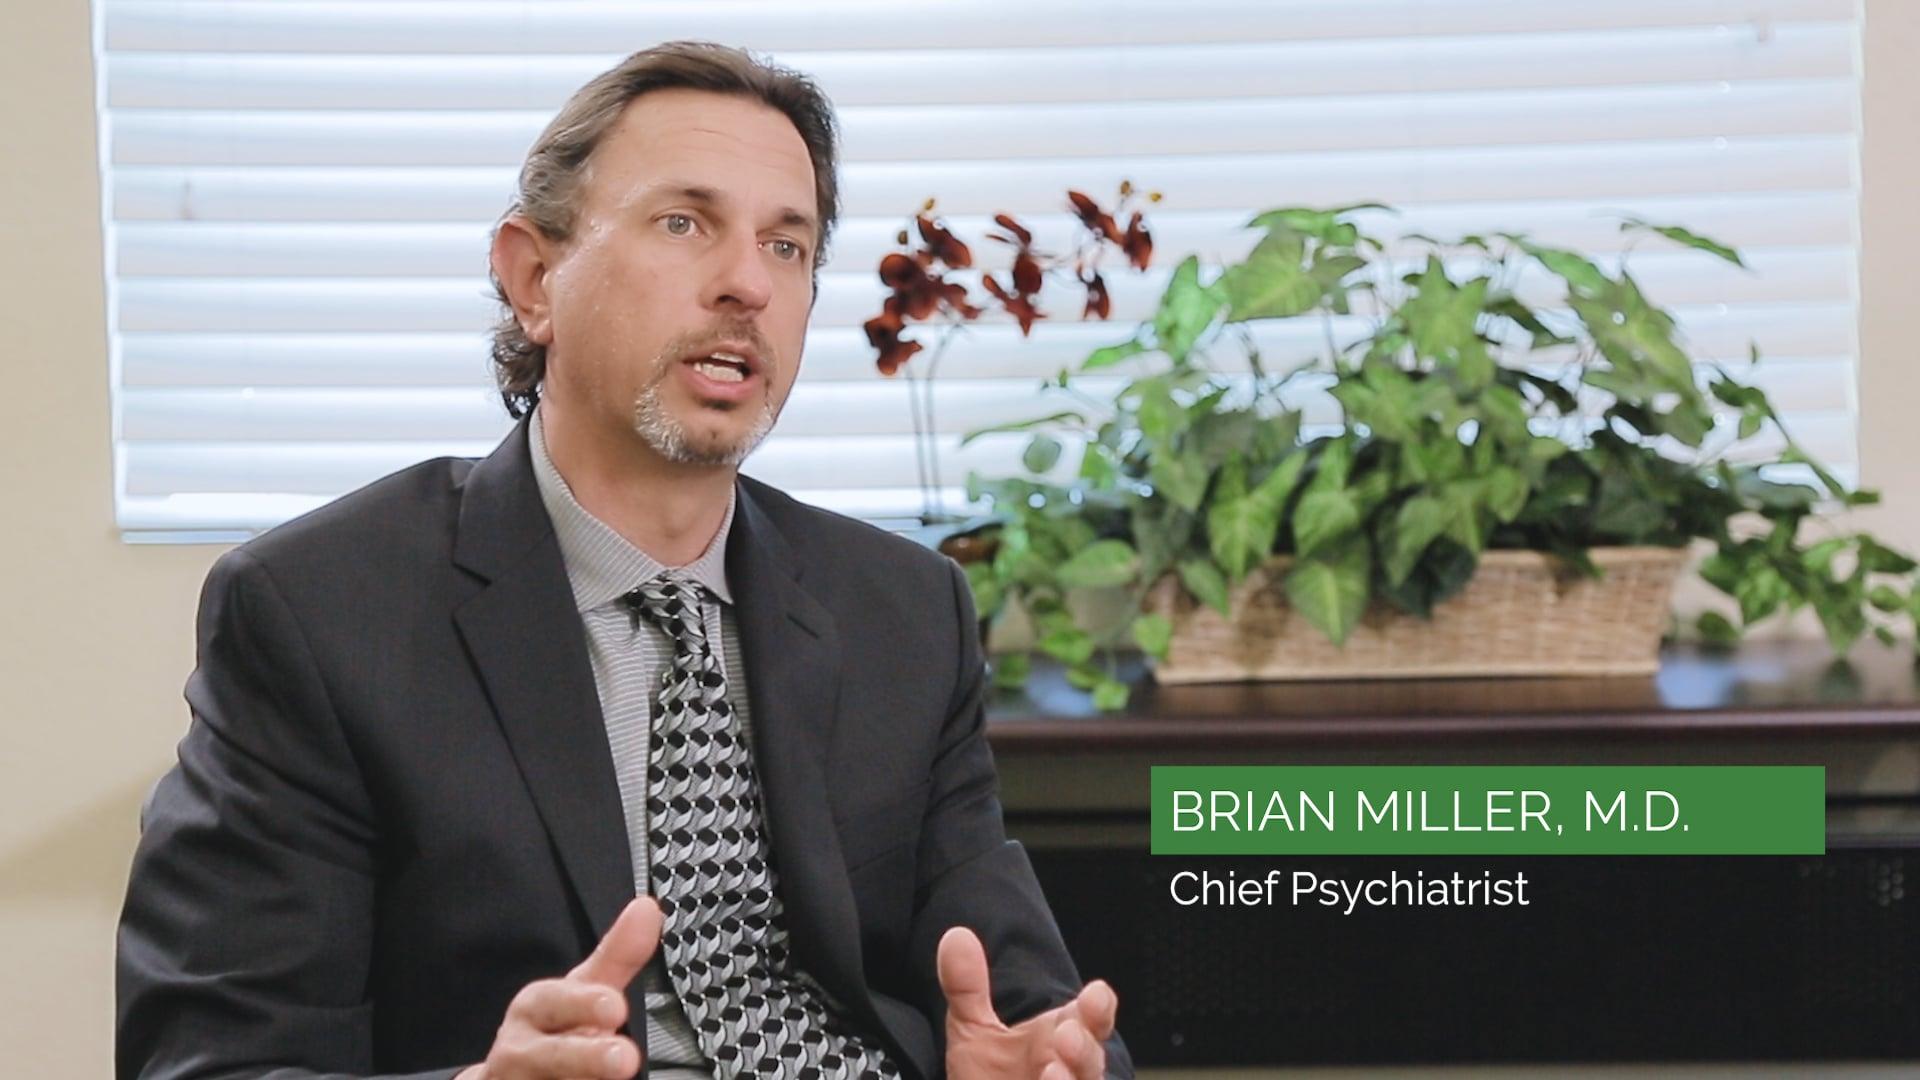 Meet Dr. Miller, Chief Psychiatrist at Alpine Special Treatment Center